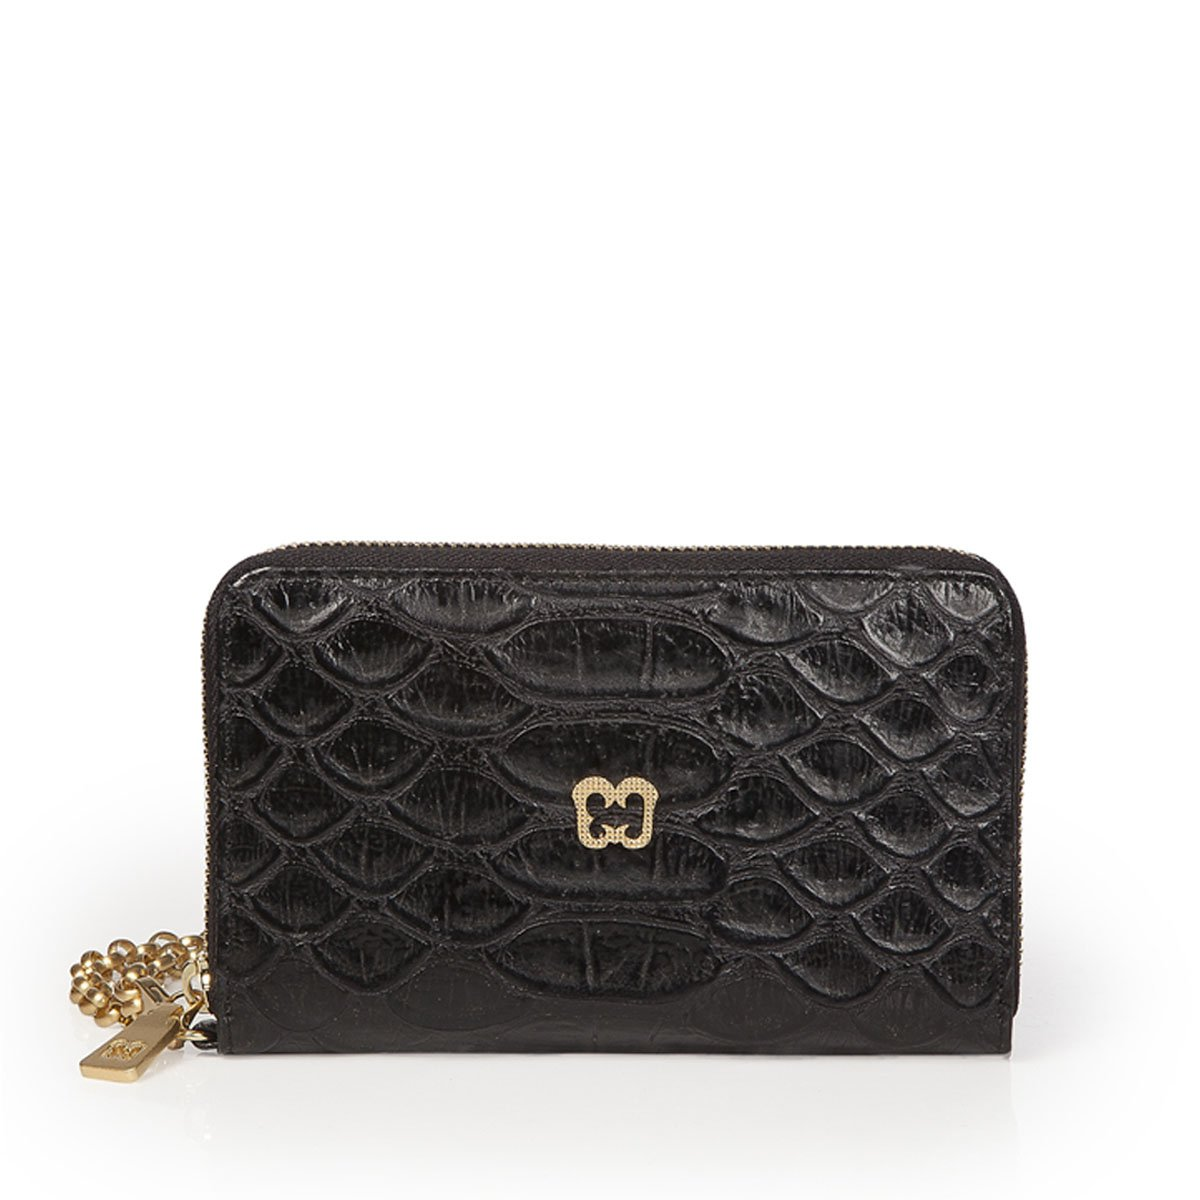 Eric Javits Luxury Fashion Designer Women's Handbag - Smartphone Wristlet - Black